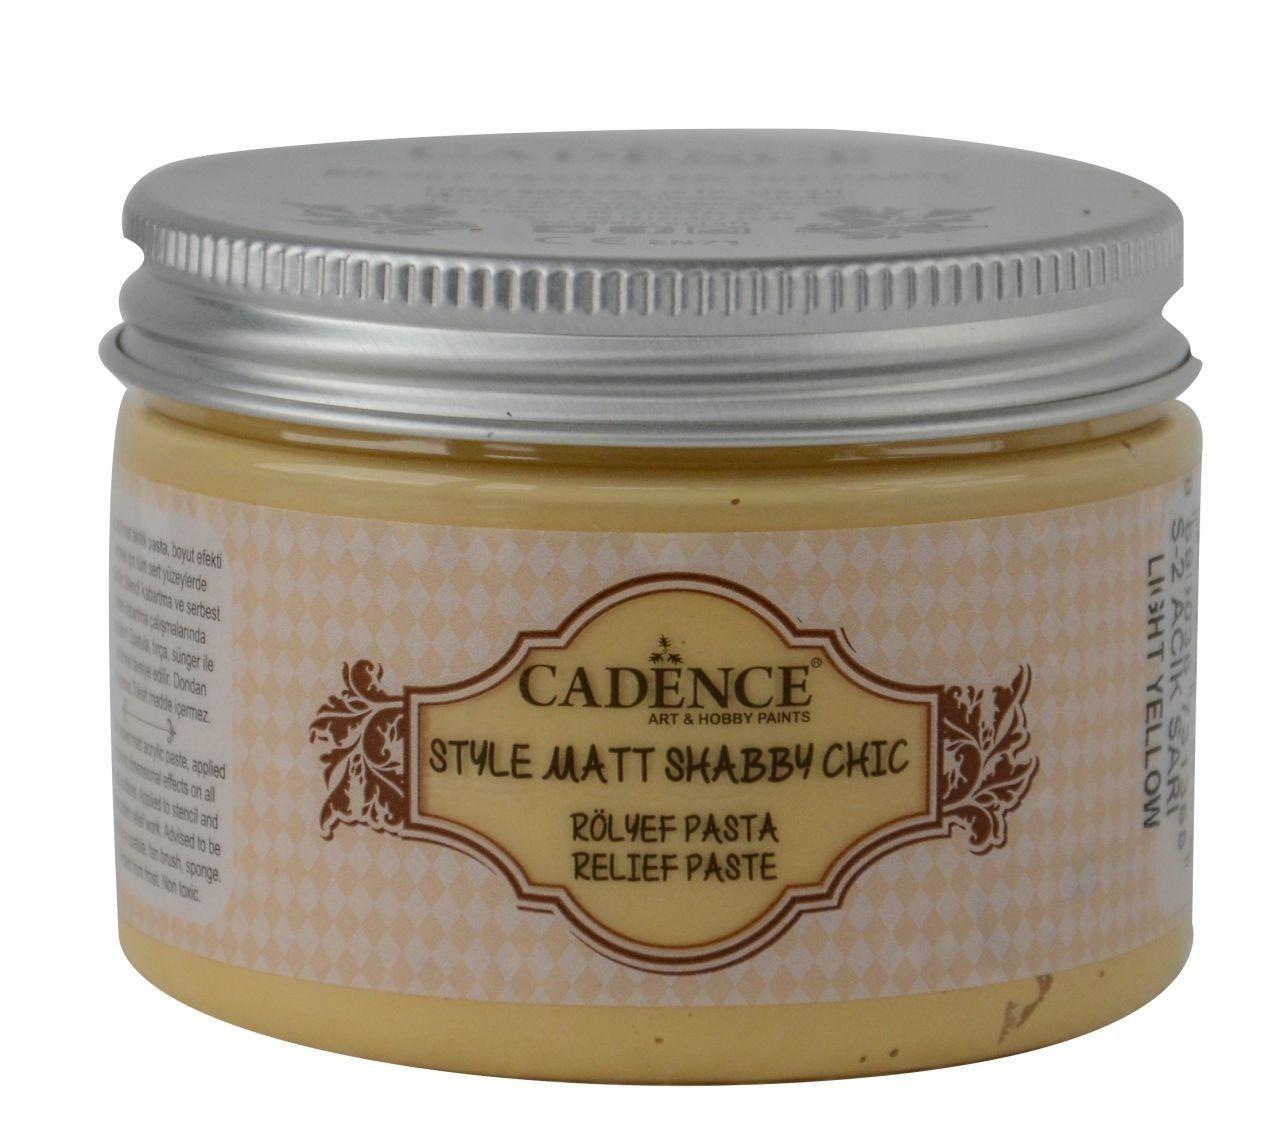 SR02 Açık Sarı Shabby Chic Rölyef Pasta(Mat) fiyatları